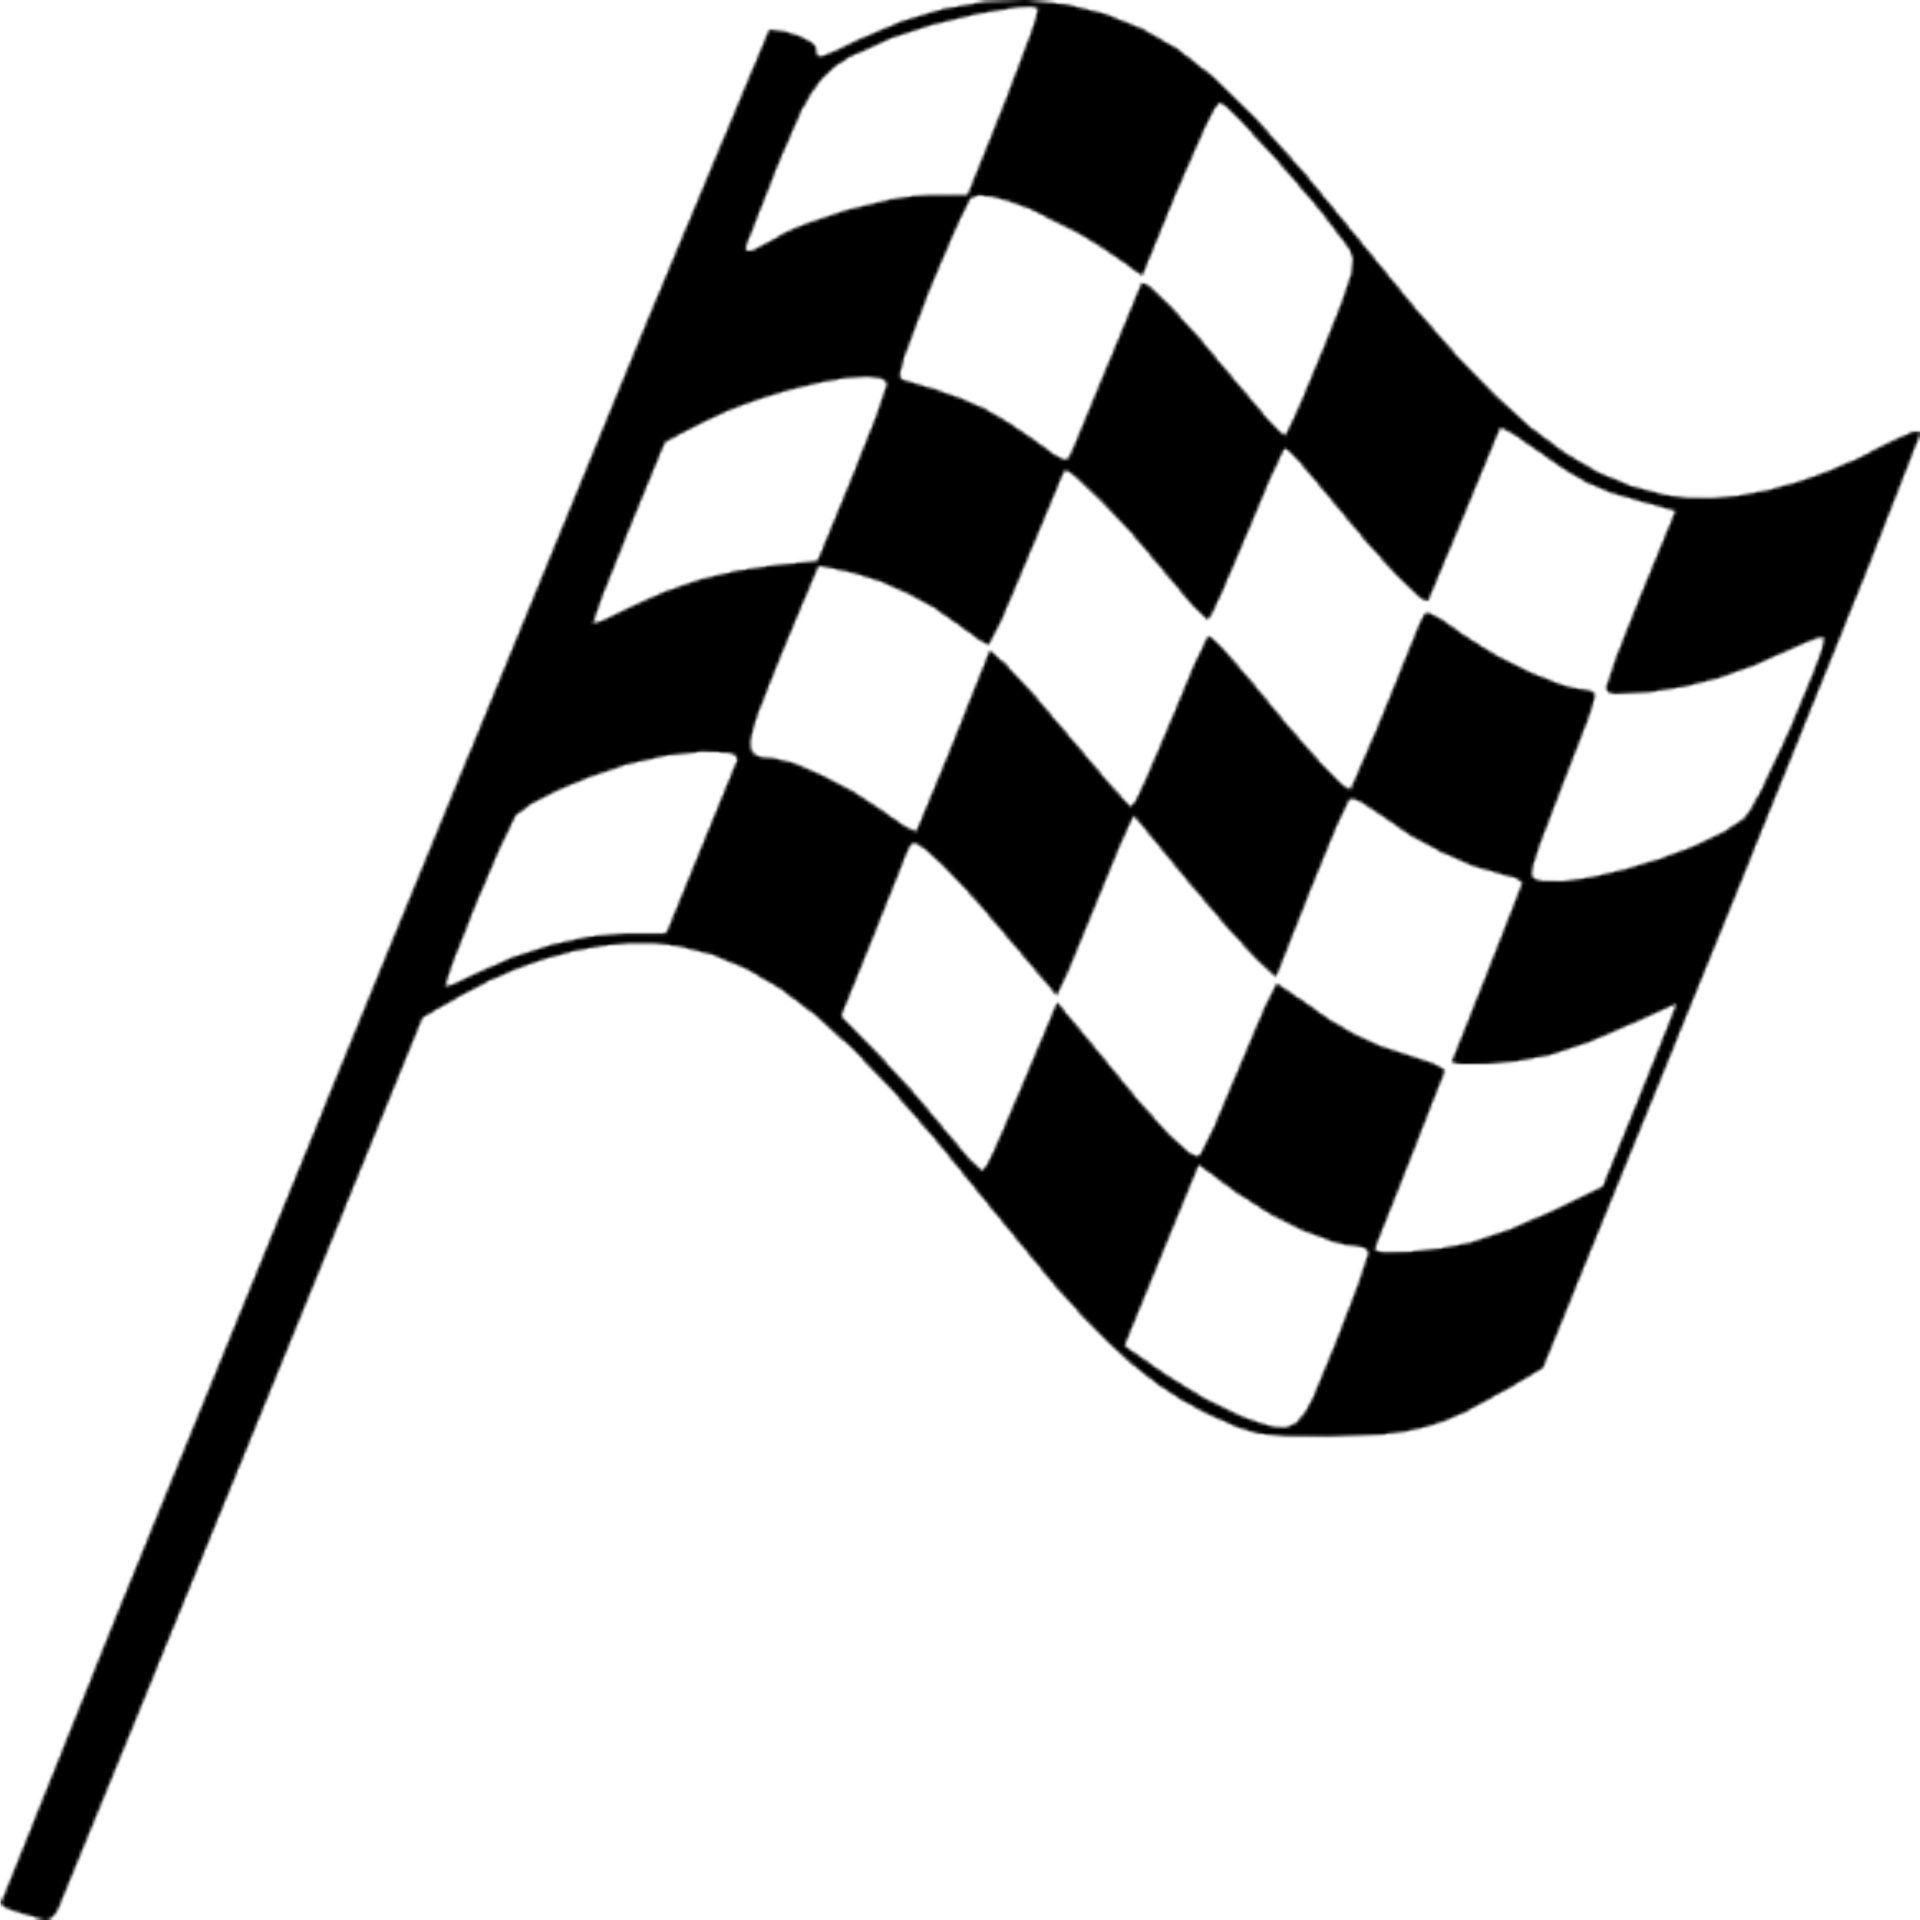 Rectangle Checker Flag Free Stock Photo